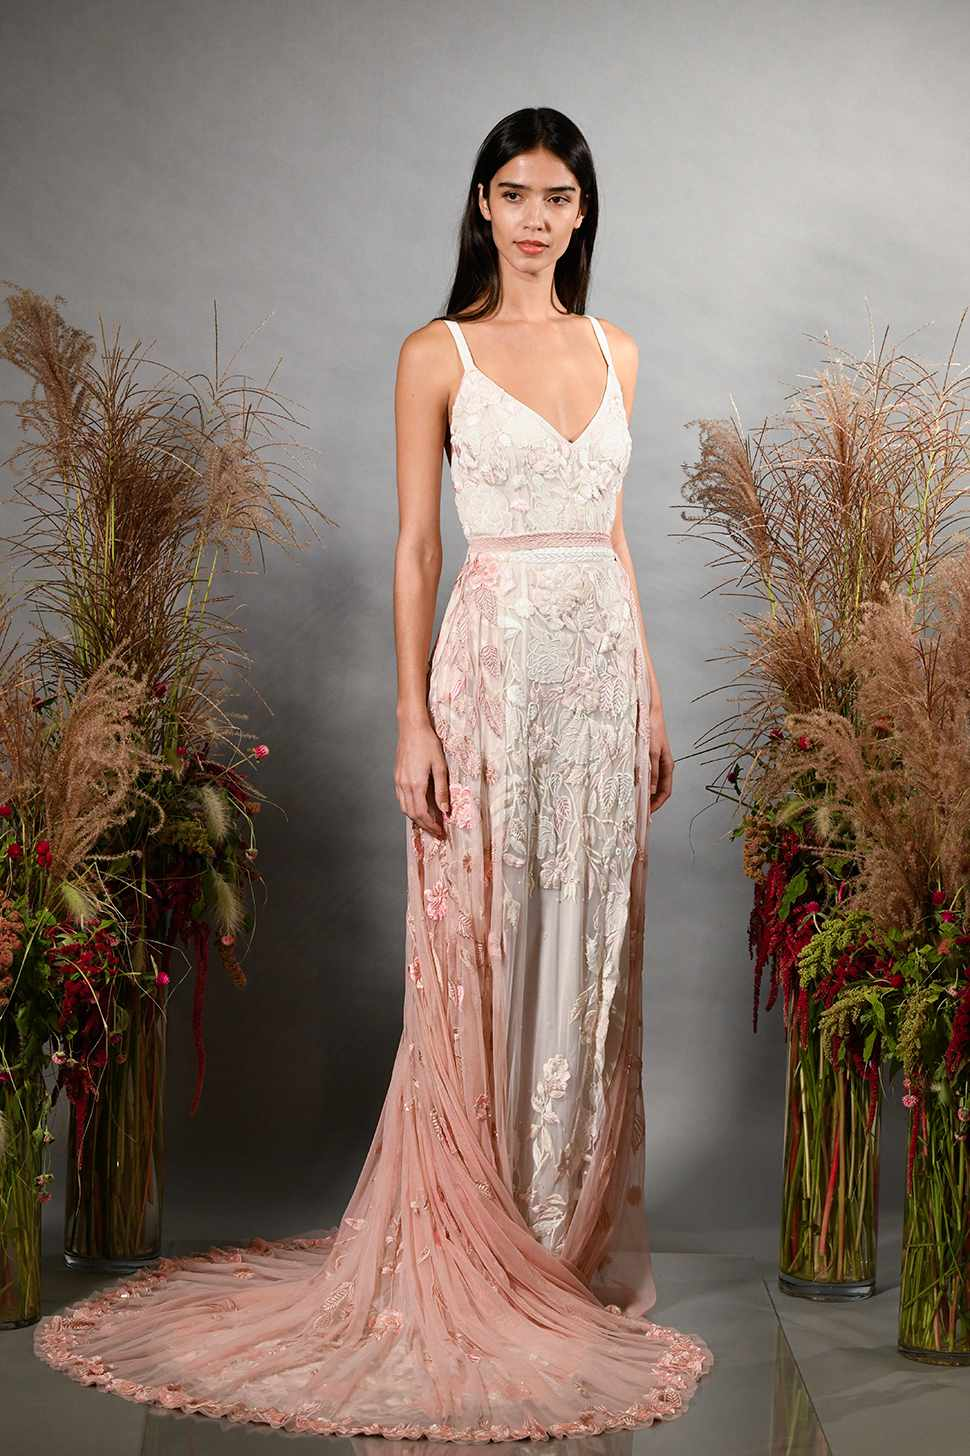 Model in pink sleeveless wedding dress